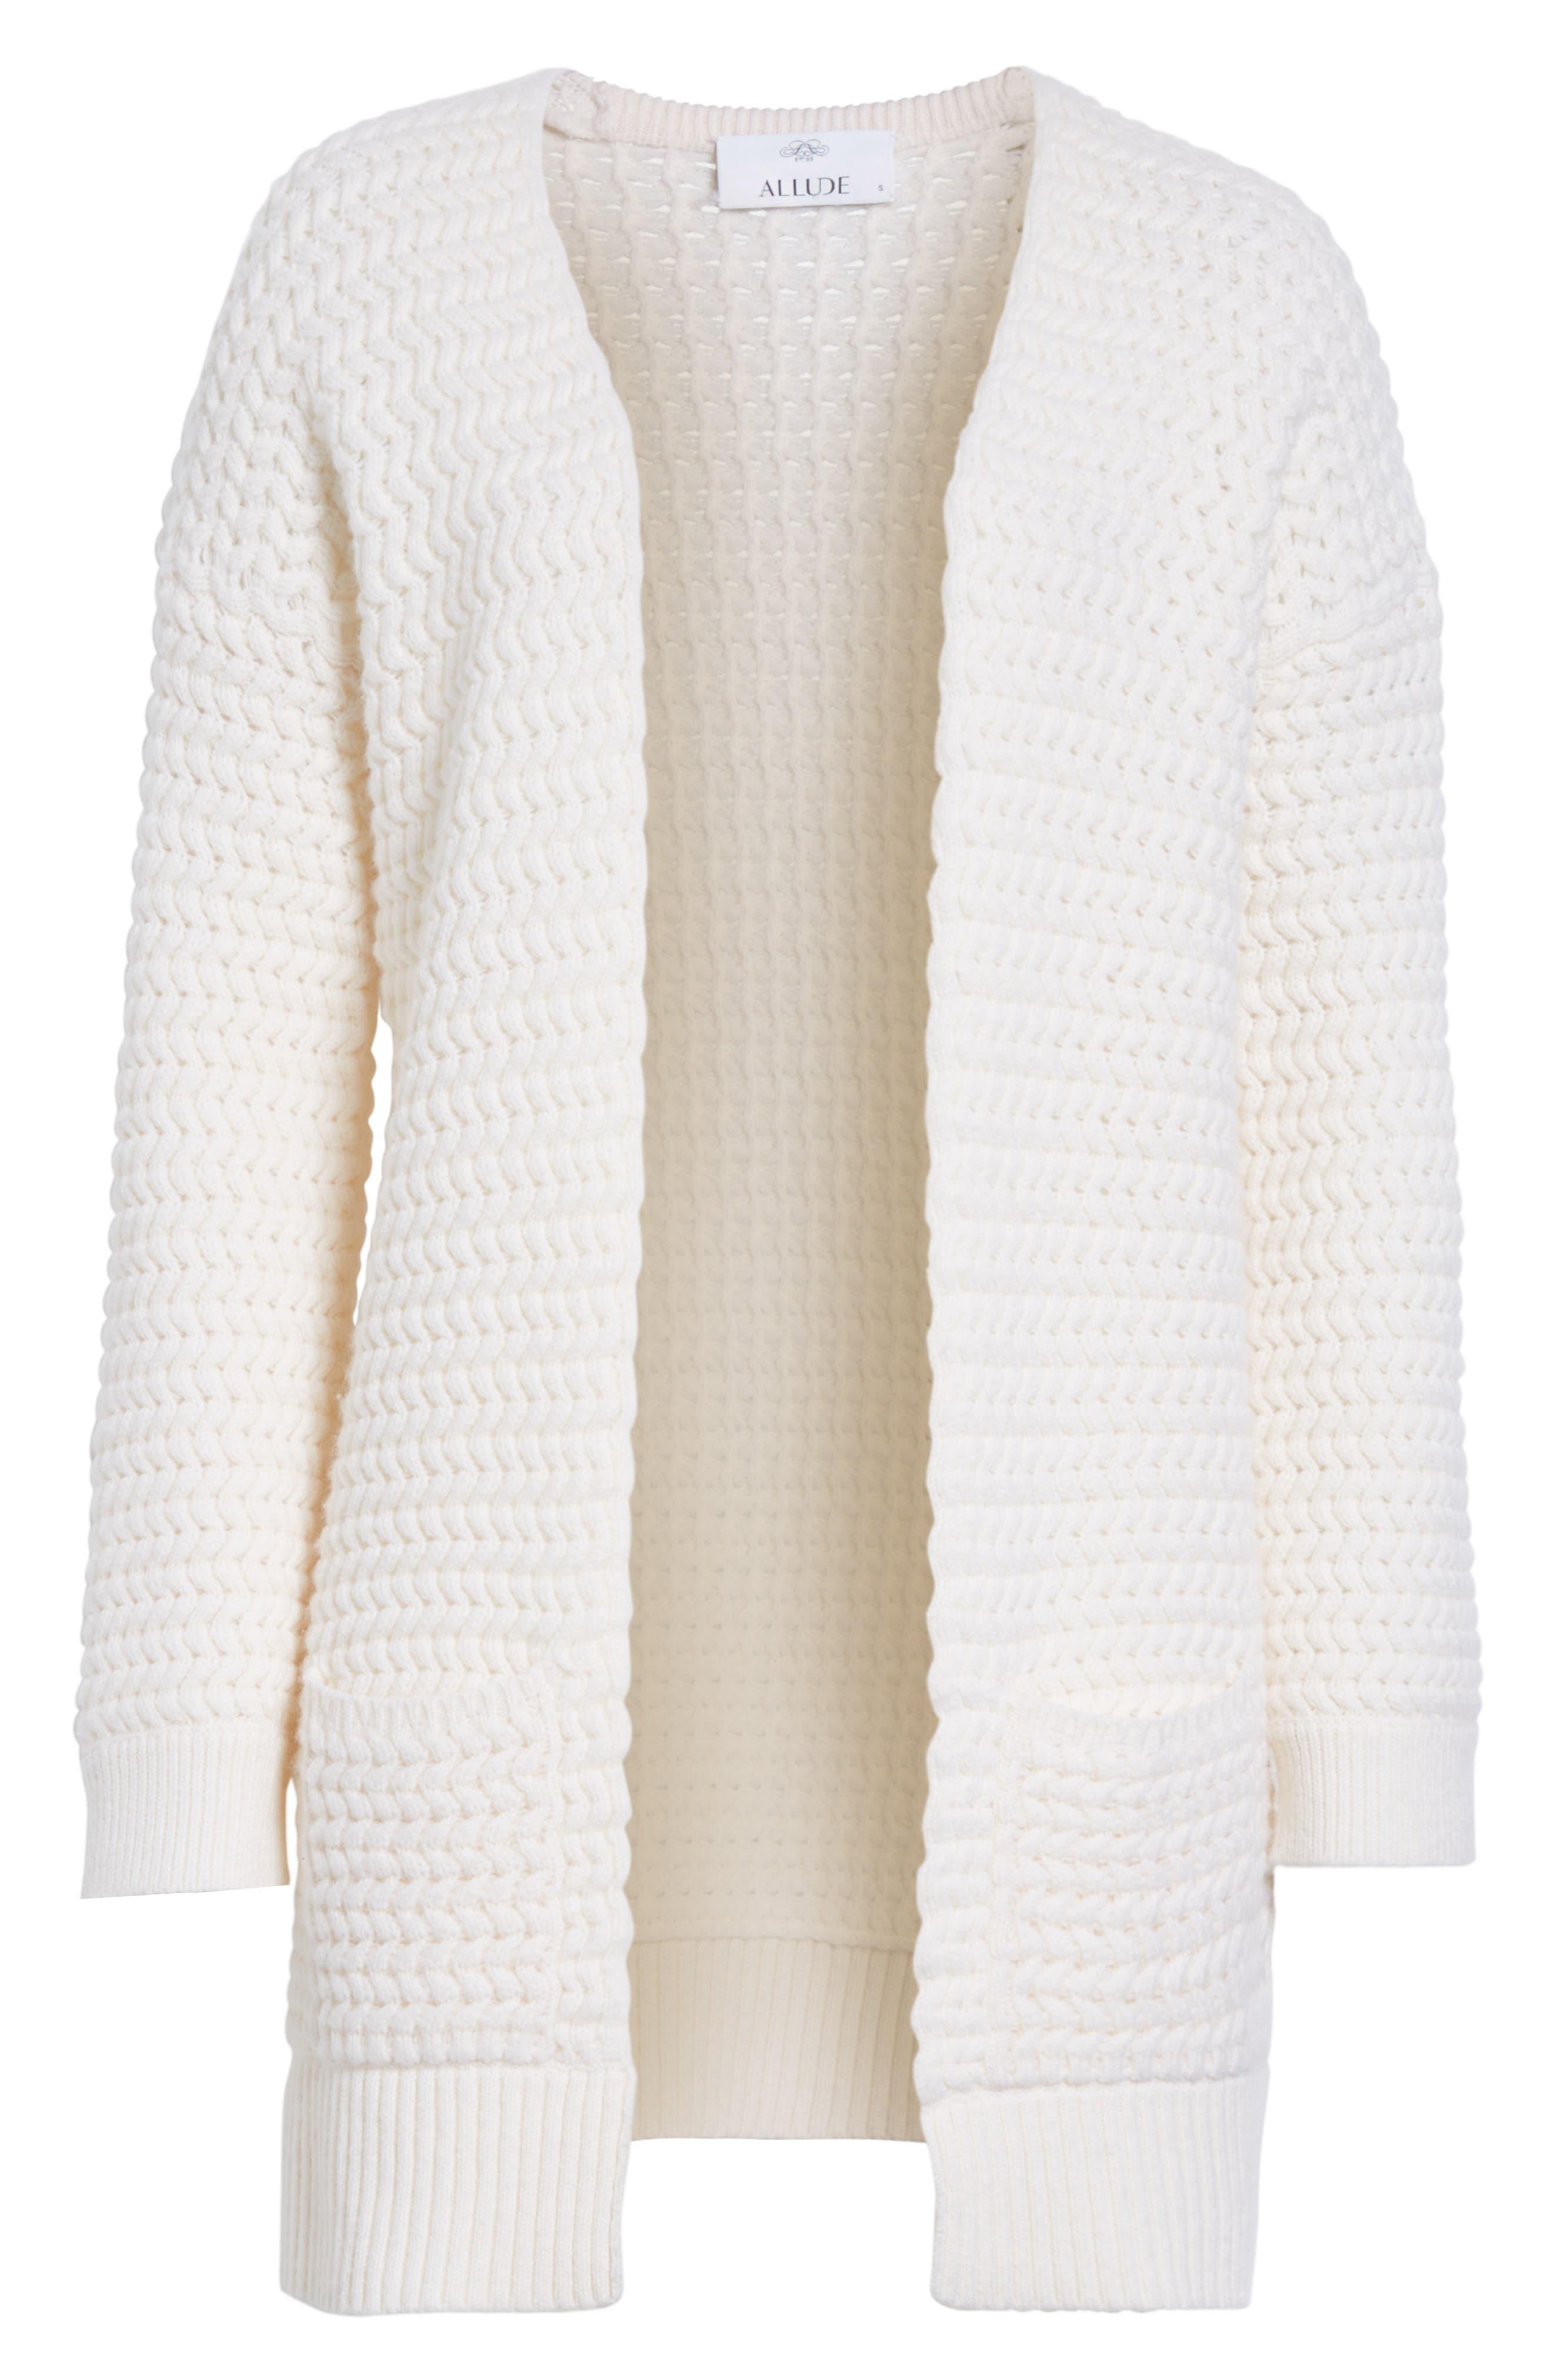 Wavy Knit Merino Wool & Cashmere Cardigan,                             Alternate thumbnail 6, color,                             905